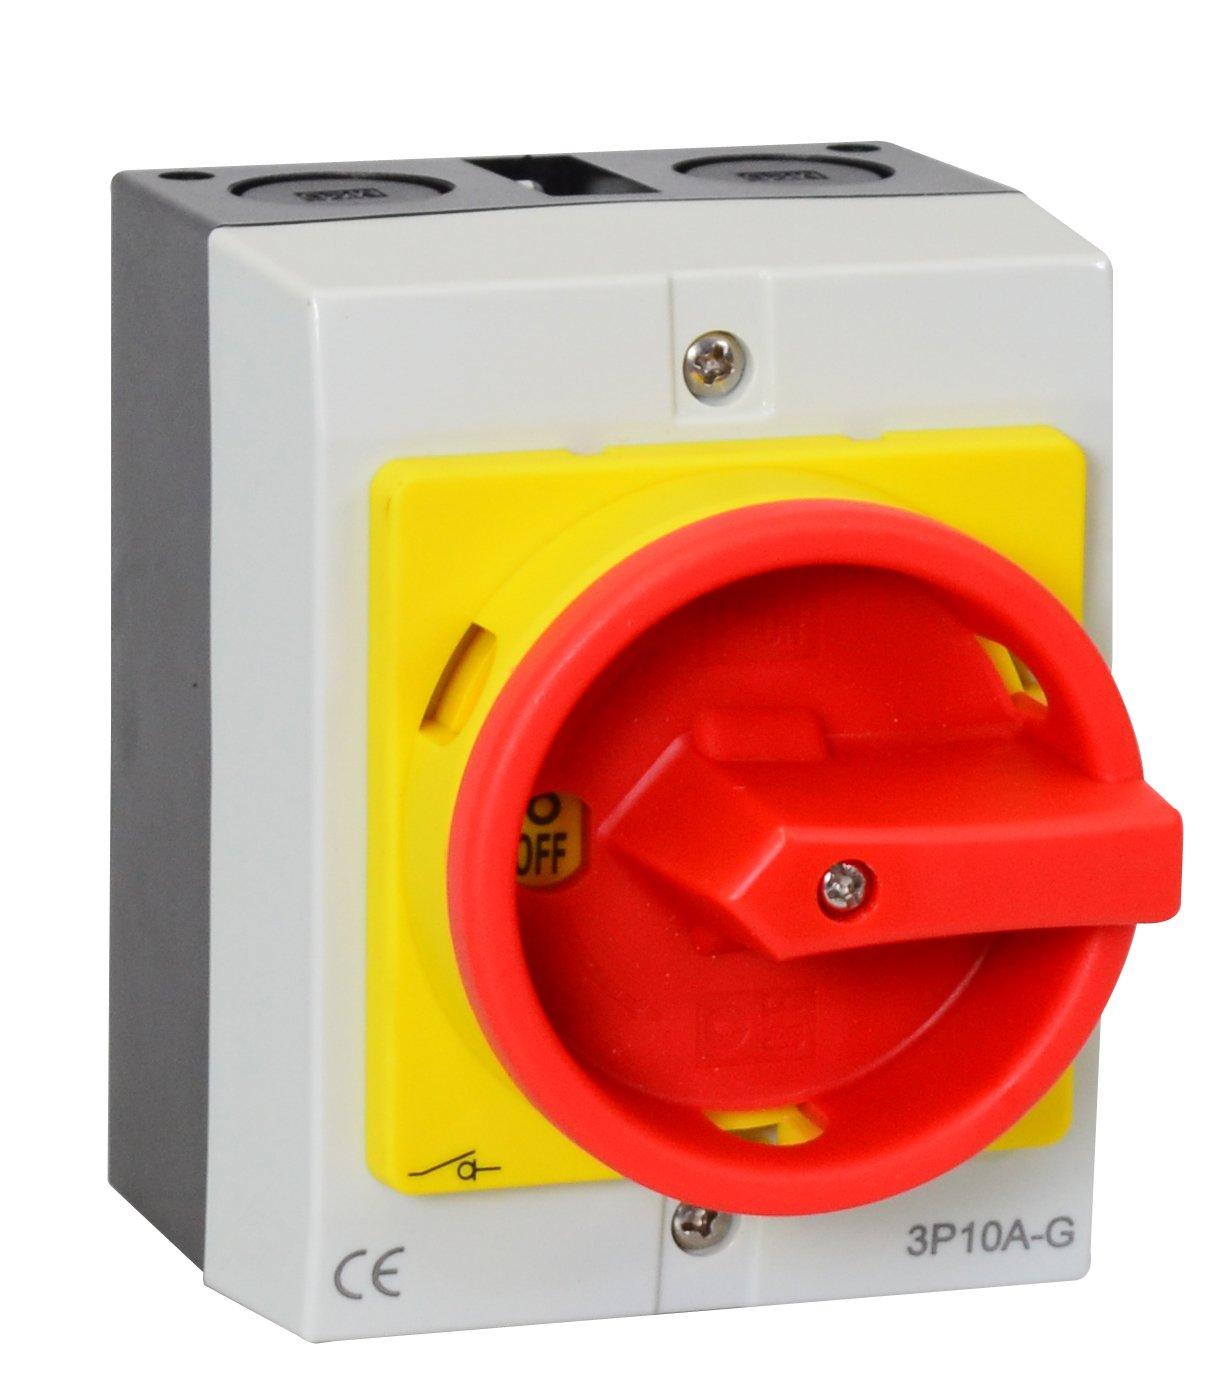 Interrupteur principal dans le boî tier 4 pô les 10A Interrupteur de ré paration Interrupteur d'arrê t d'urgence Interrupteur d'arrê t d'urgence Intratec